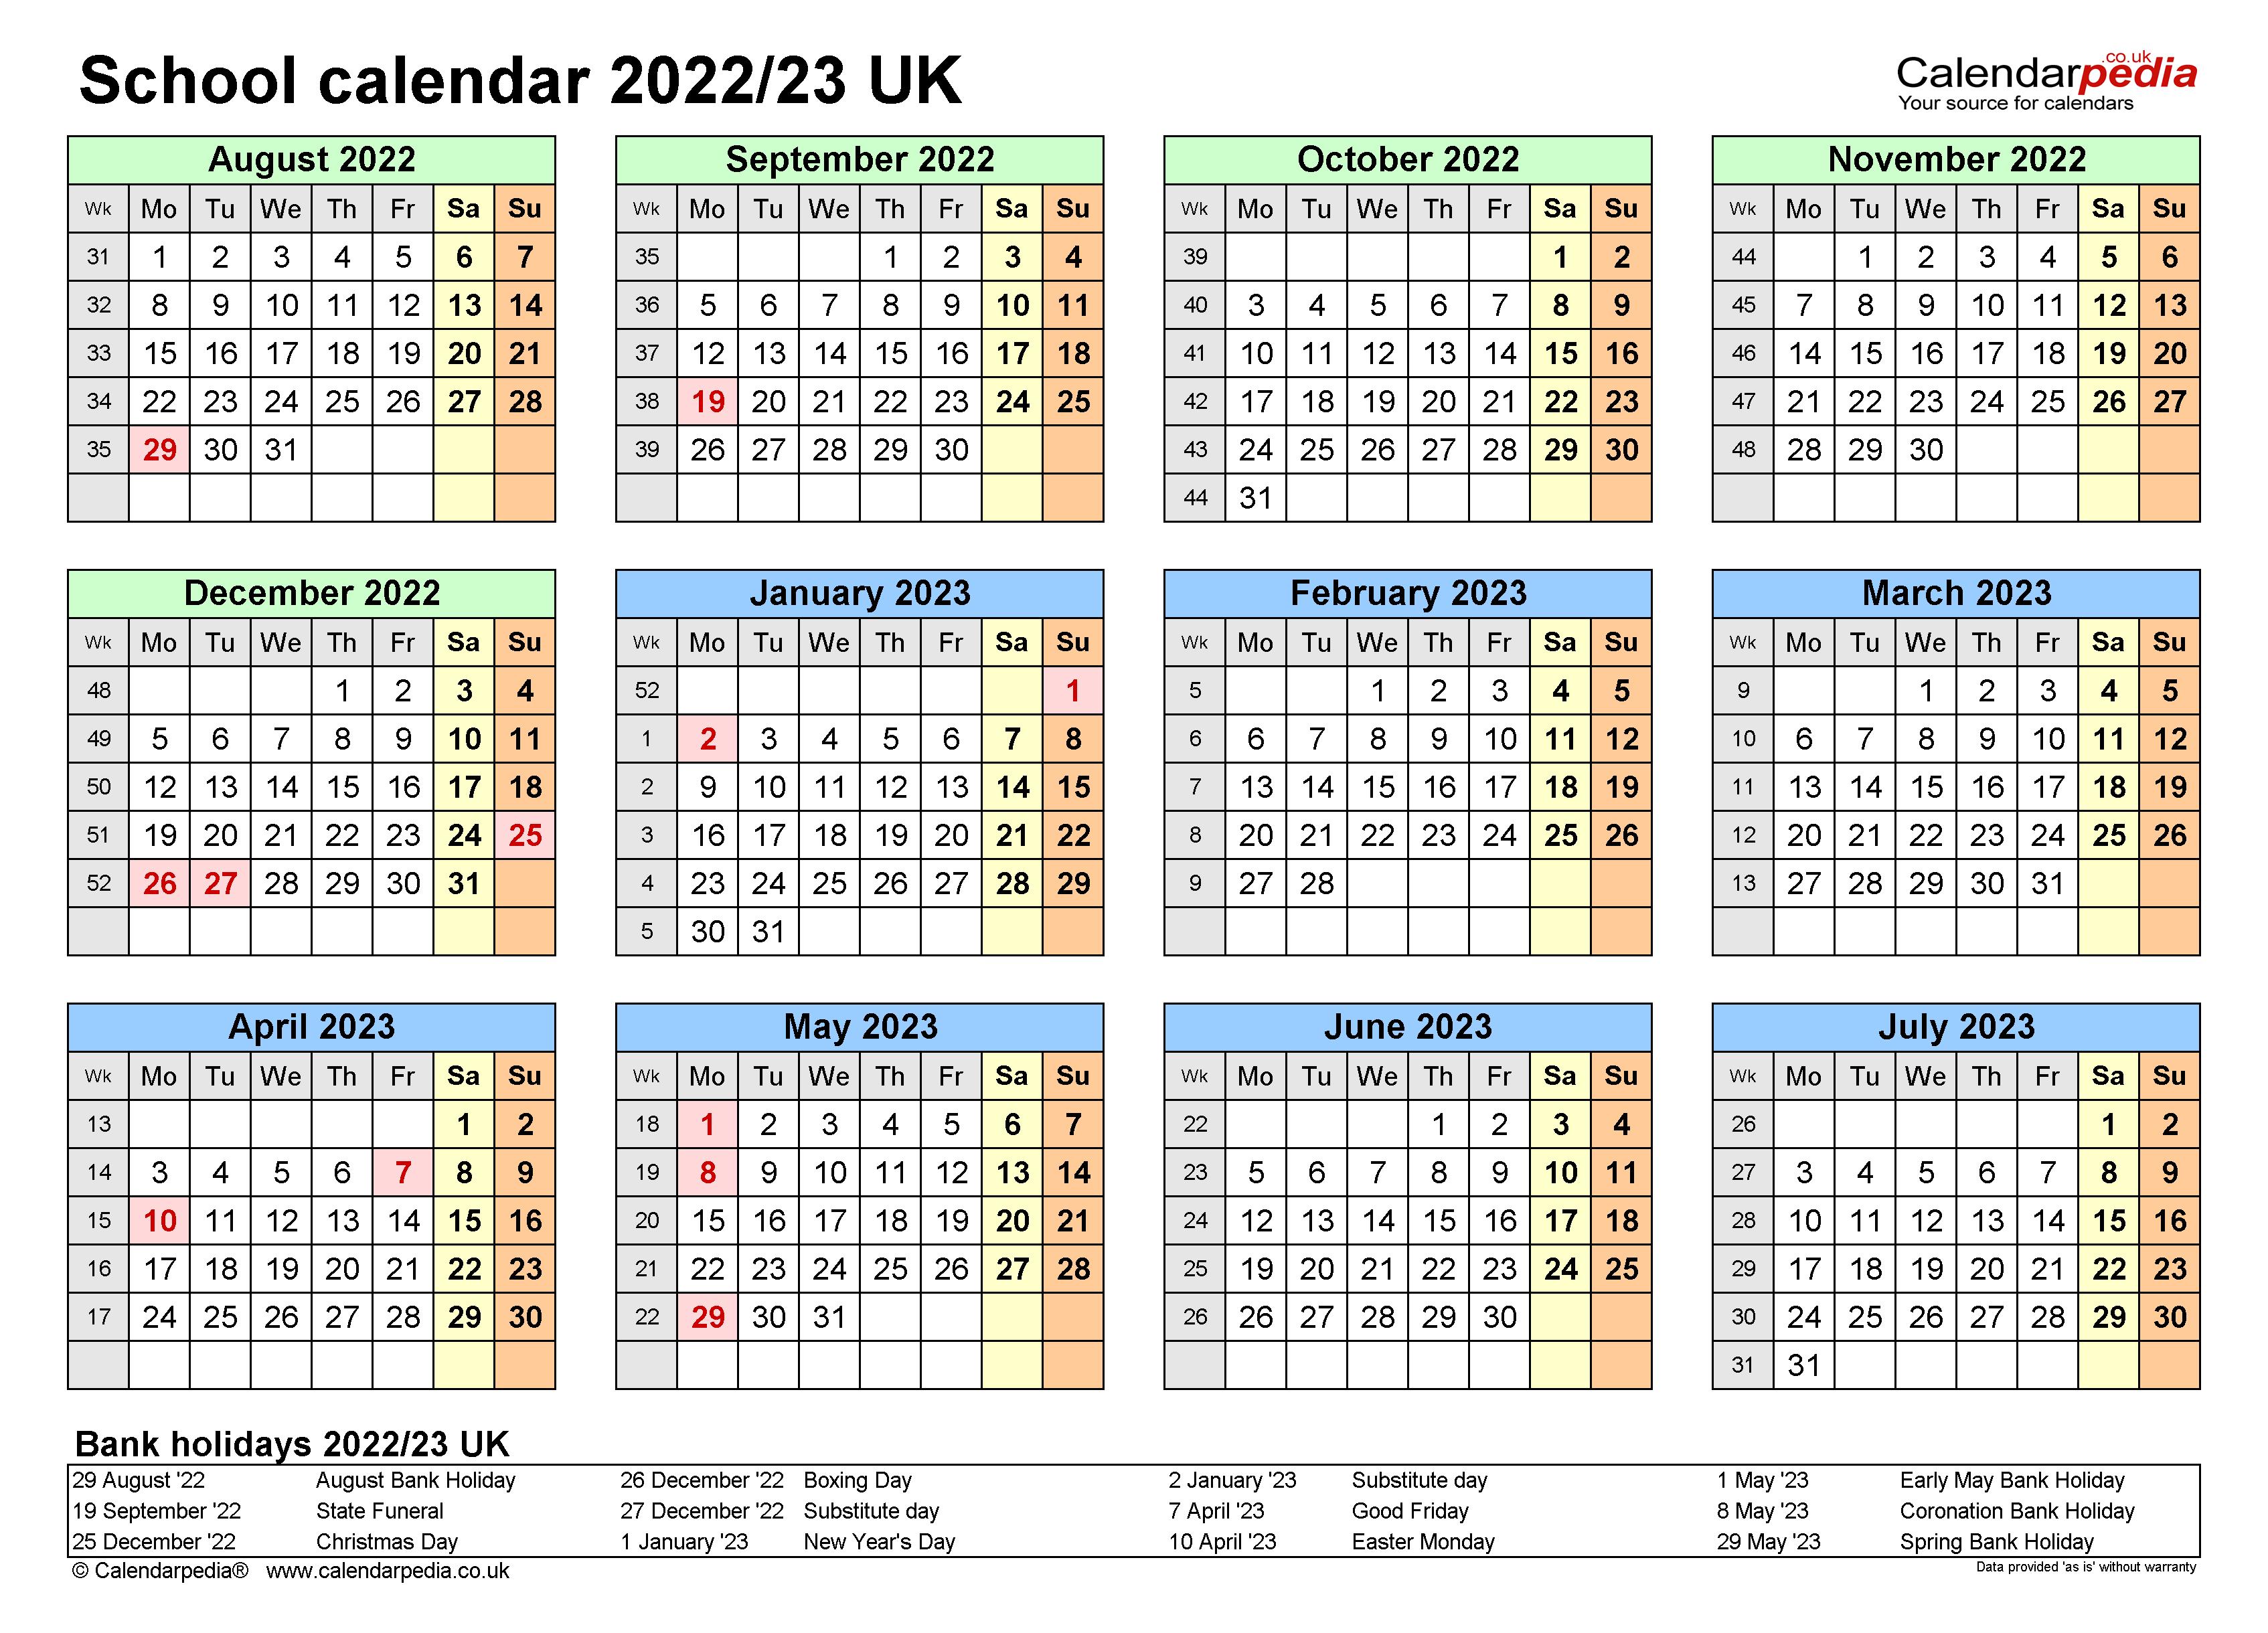 Rit Academic Calendar 2022 2023.School Calendars 2022 23 Uk Free Printable Excel Templates